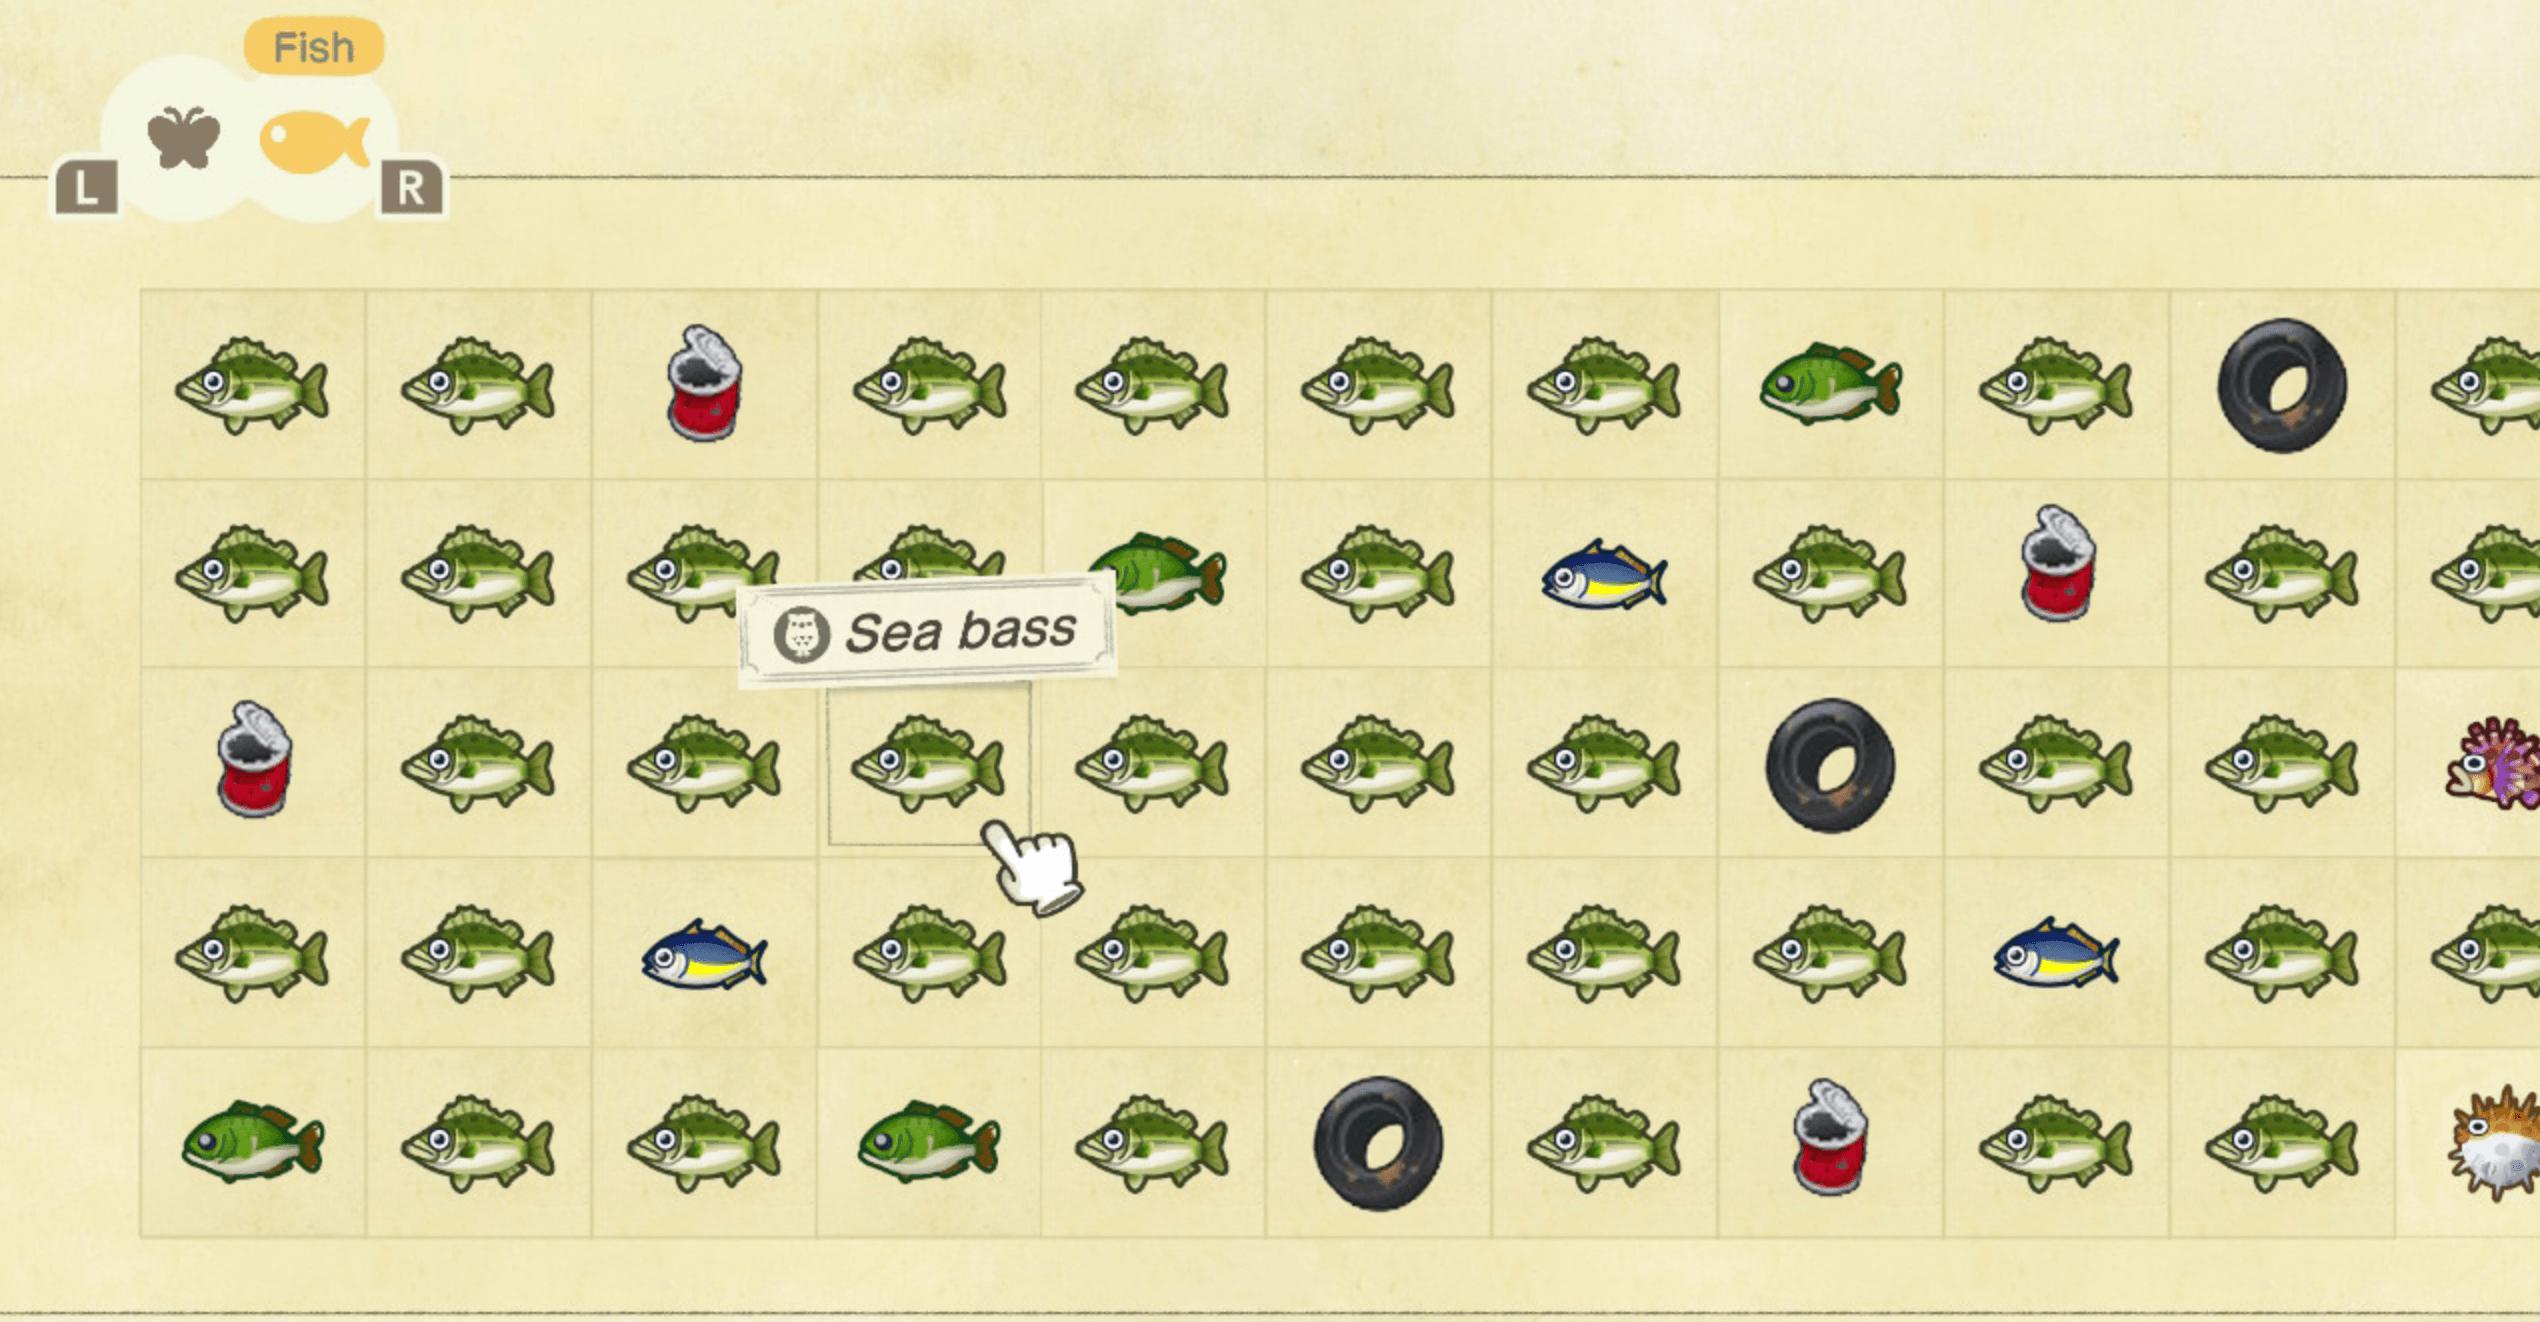 critterpedia showing fish